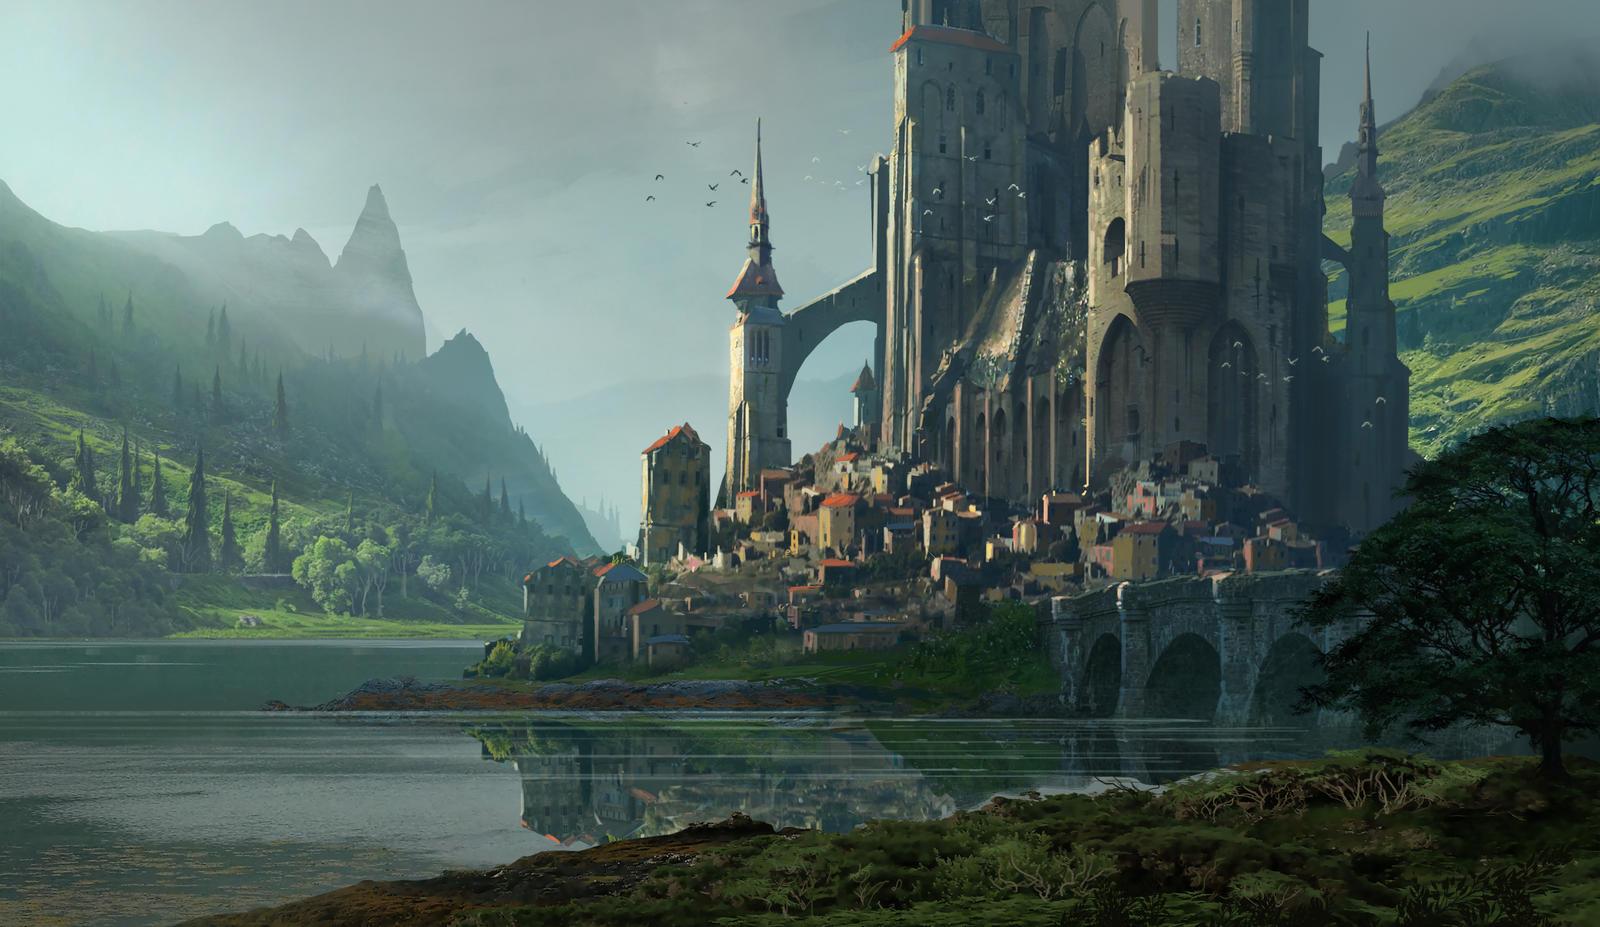 Kvasir Fortress by Raphael-Lacoste on DeviantArt